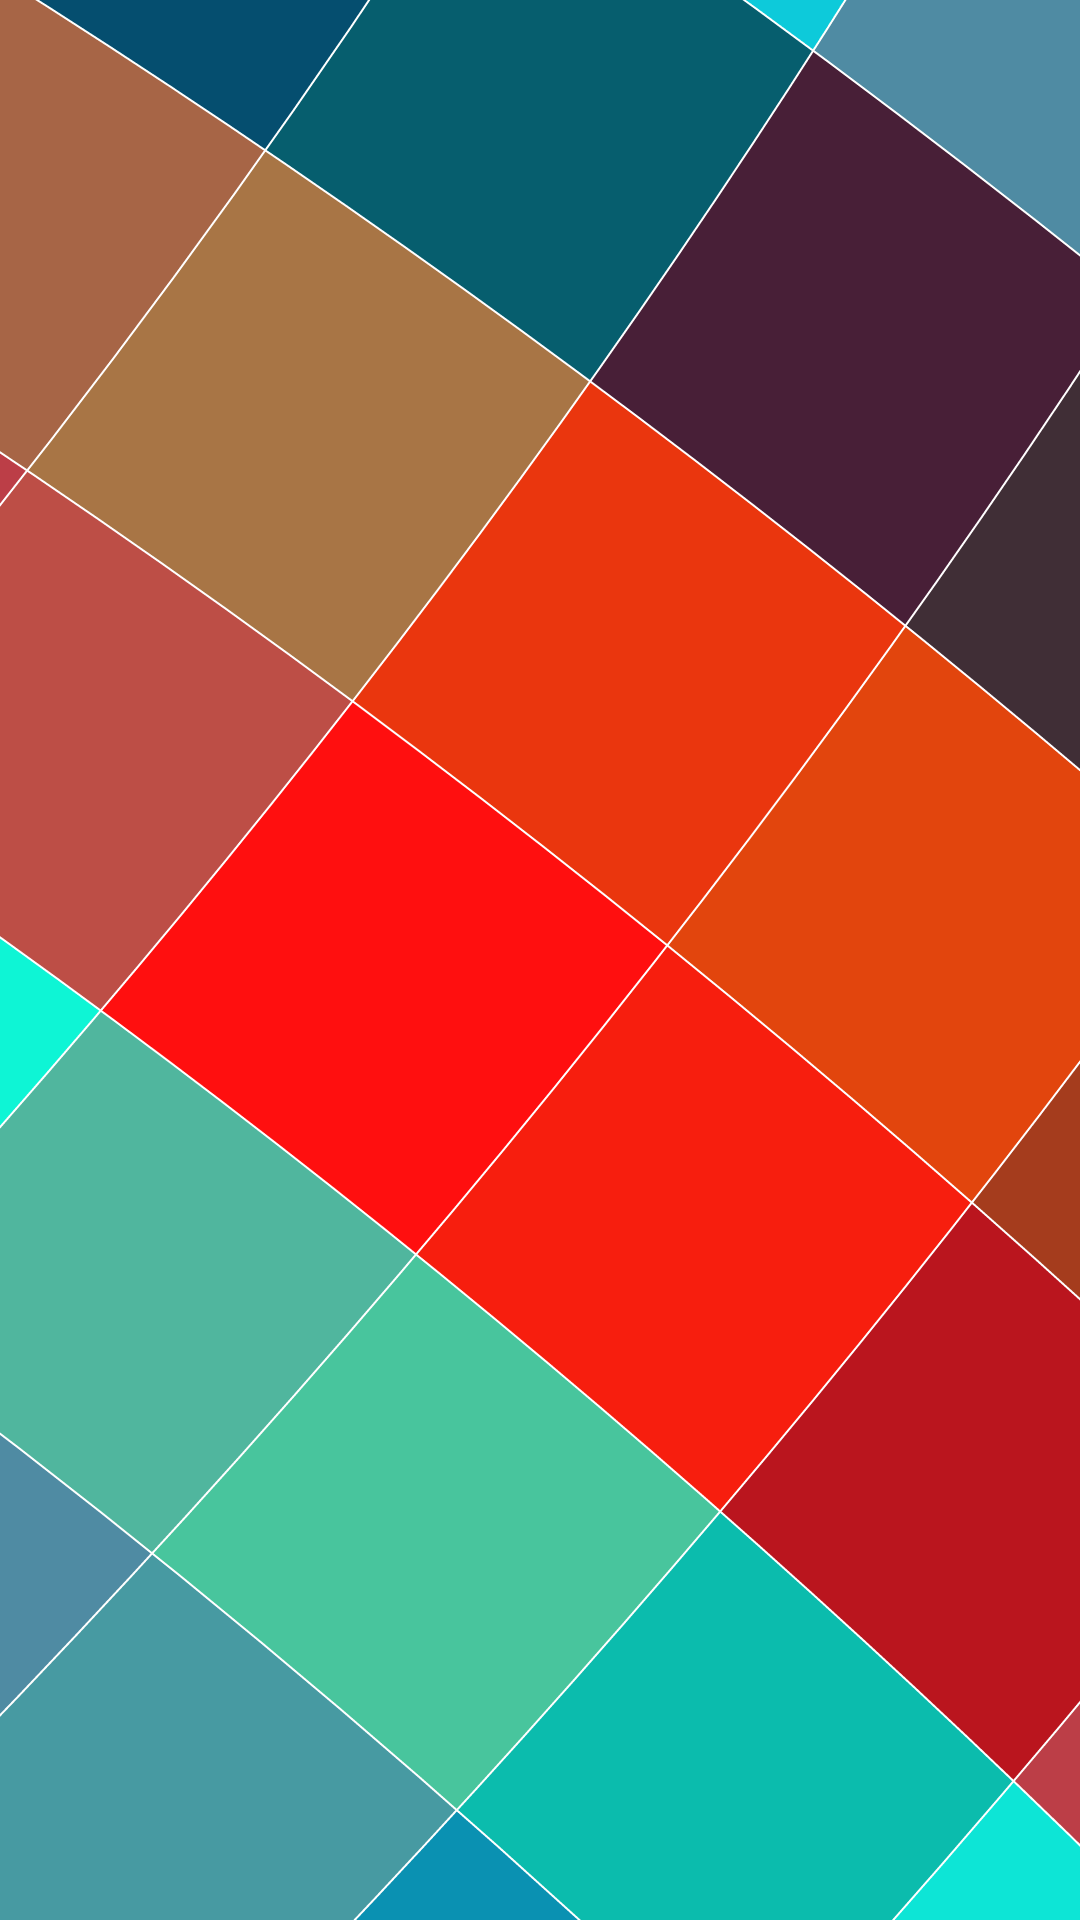 Simple Iphone X Wallpaper Hd 1080 X 1920 Images Vertical Pixelstalk Net